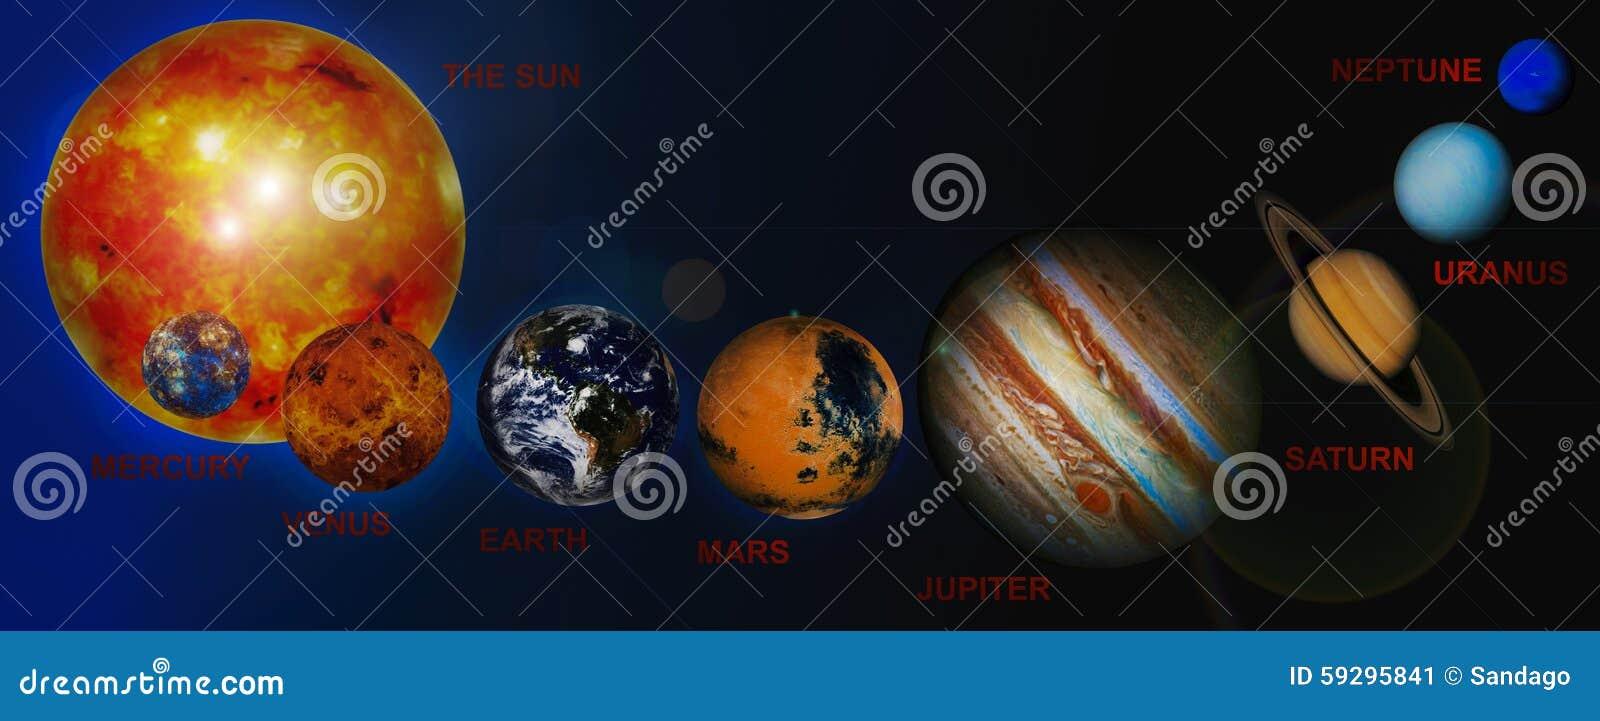 Solar System Planets. Stock Illustration - Image: 59295841